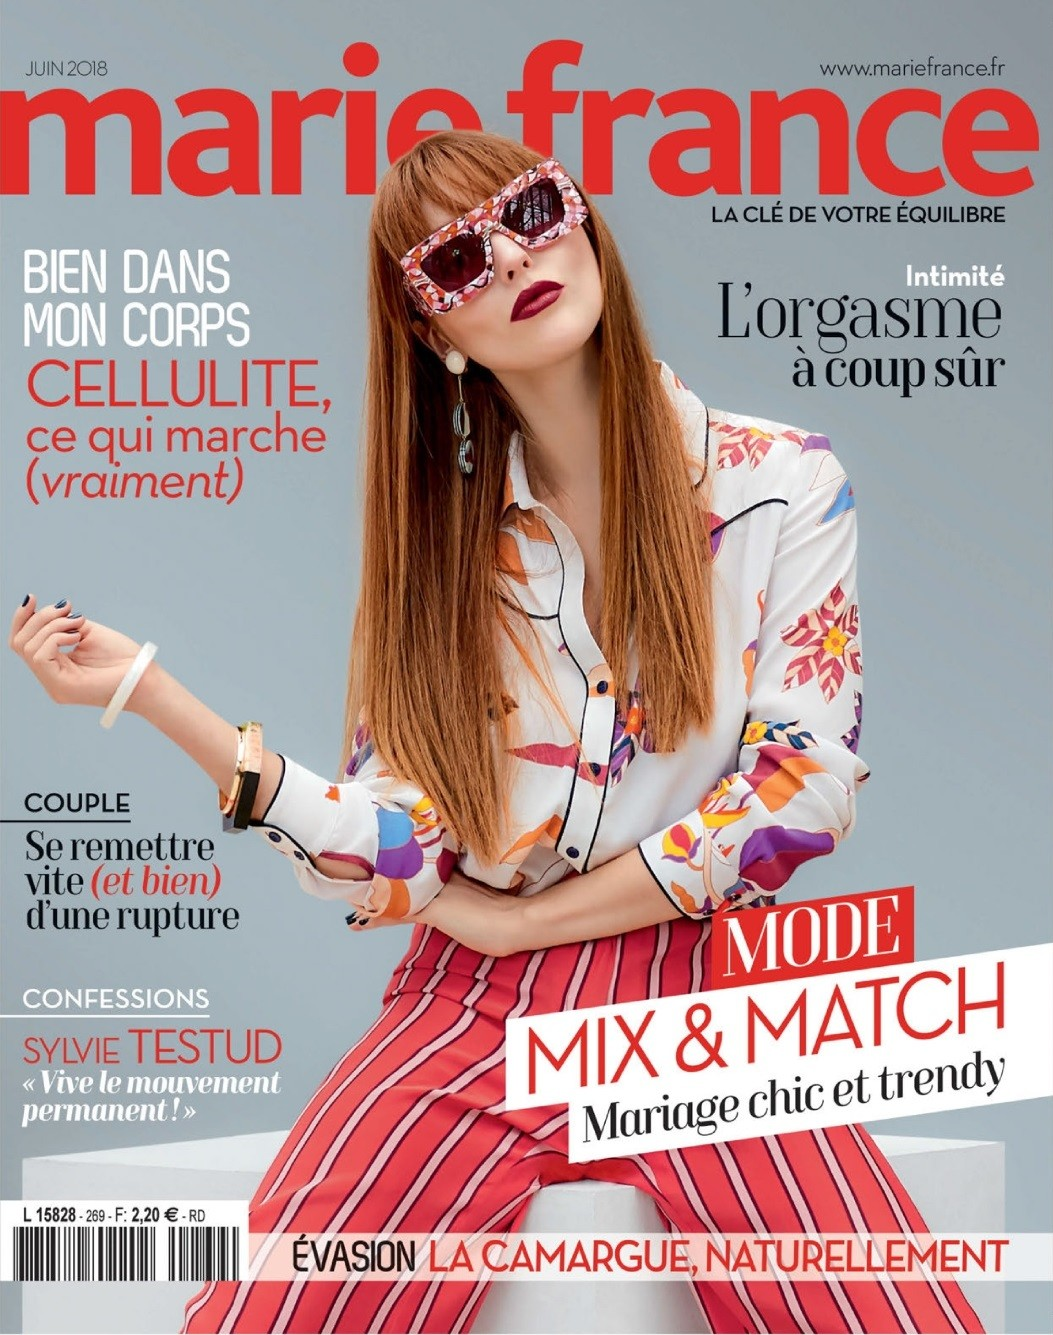 Elle Dowling - Marie france juin 2018.jpg